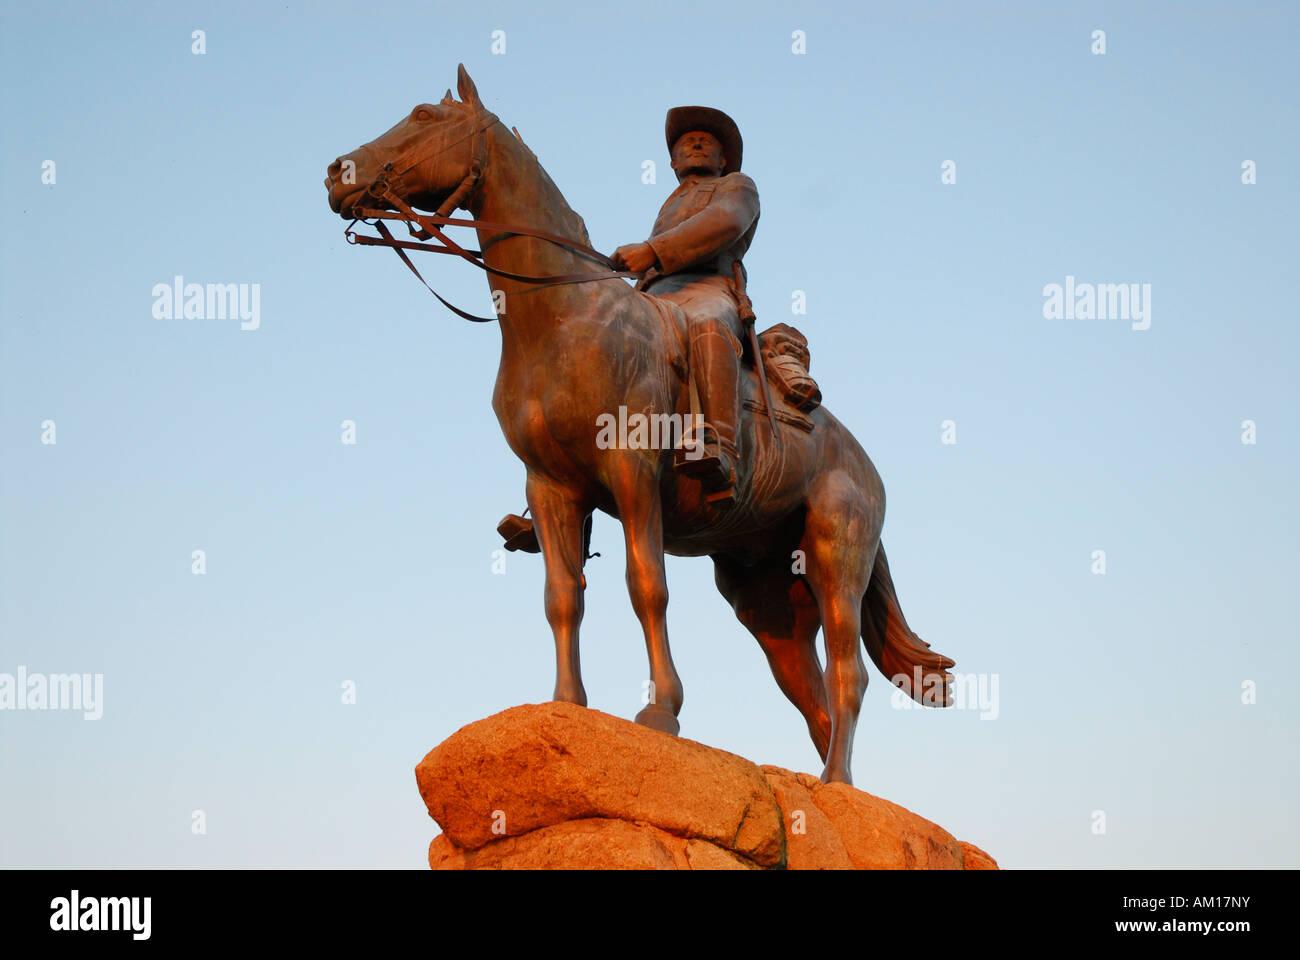 Reiterdenkmal (horseman memorial), Windhuk, Namibia Stock Photo